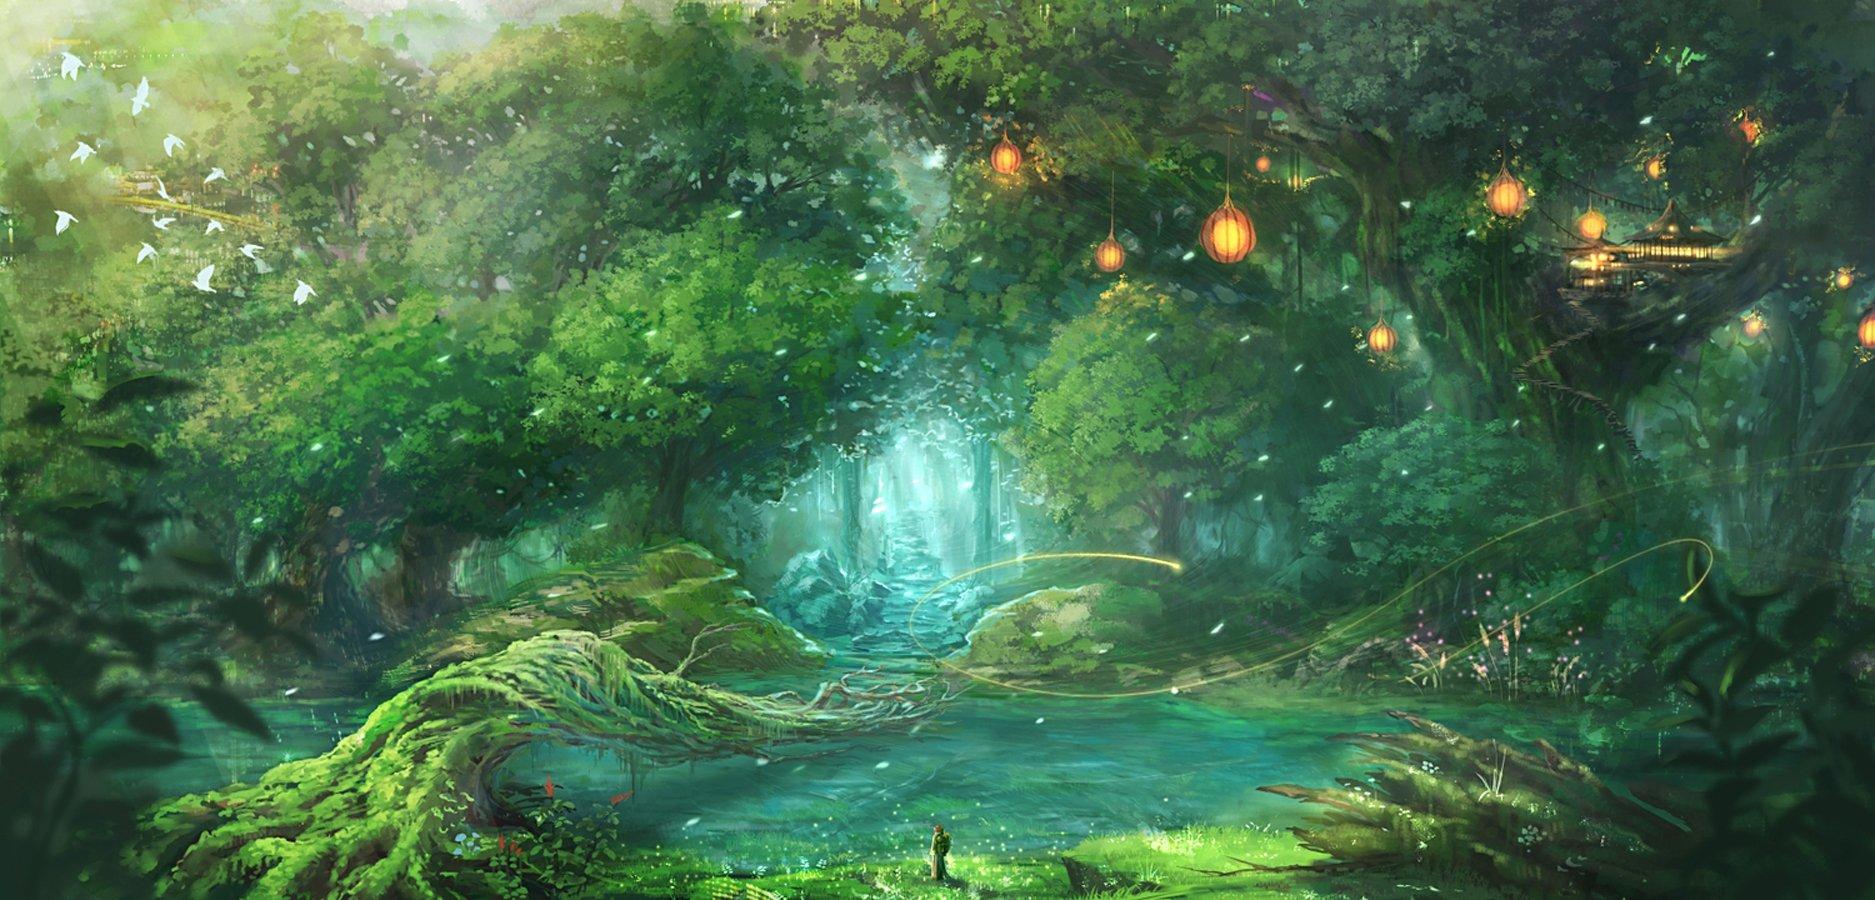 Original anime forest landscape wallpaper 1875x900 1875x900